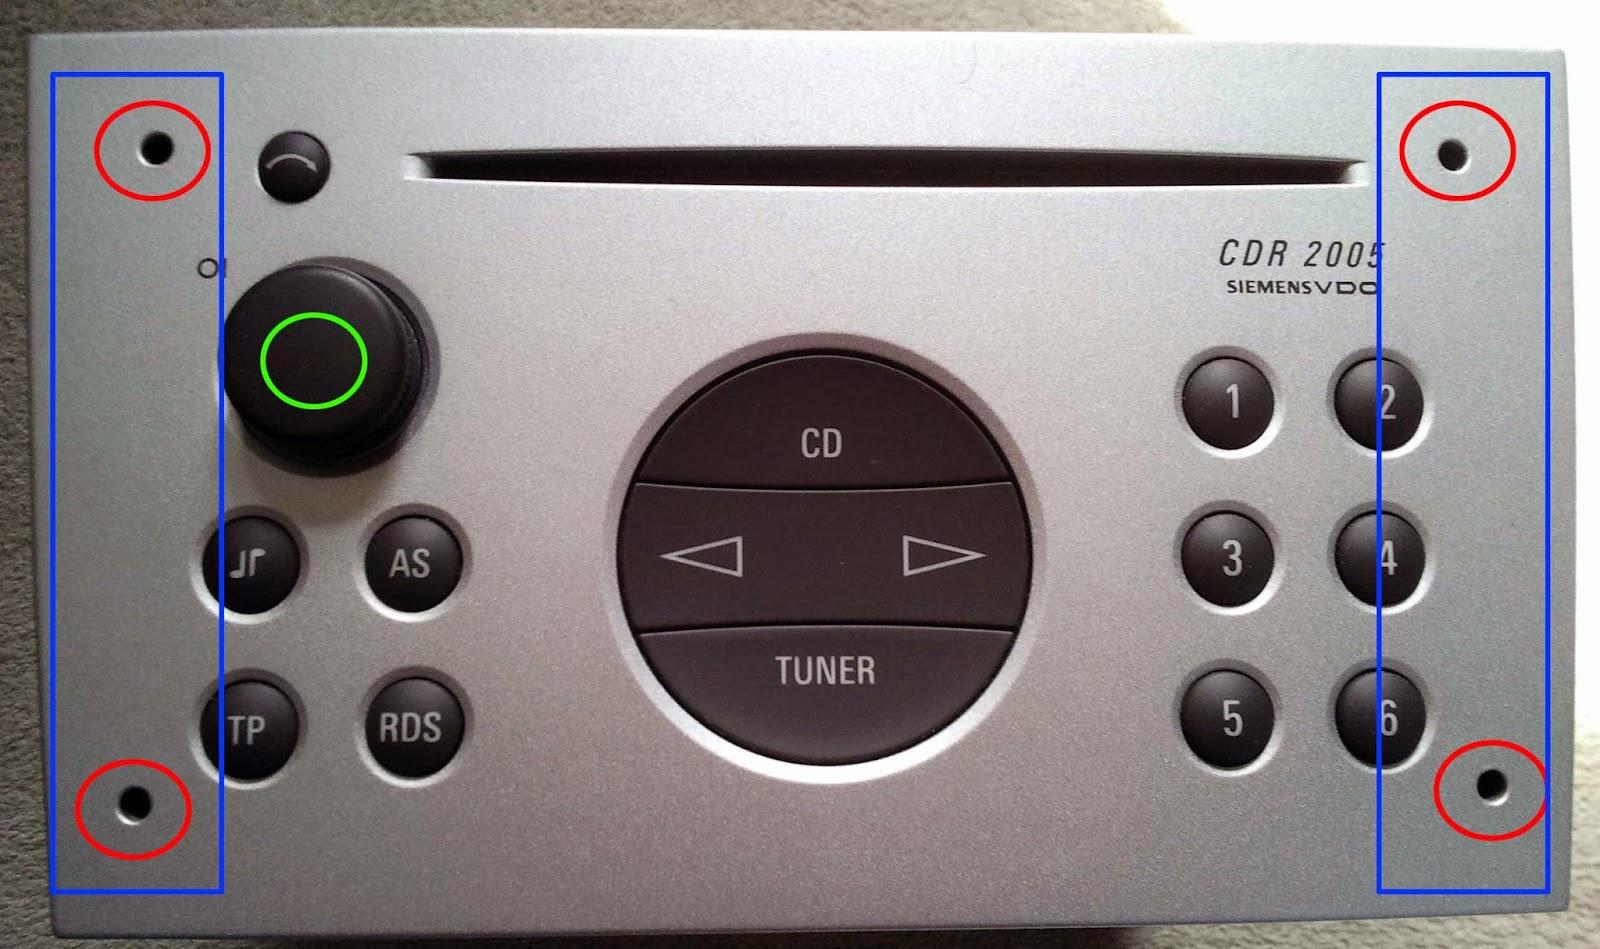 jb service: vdo cdr 2005 cd stereo in a 2003 opel corsa